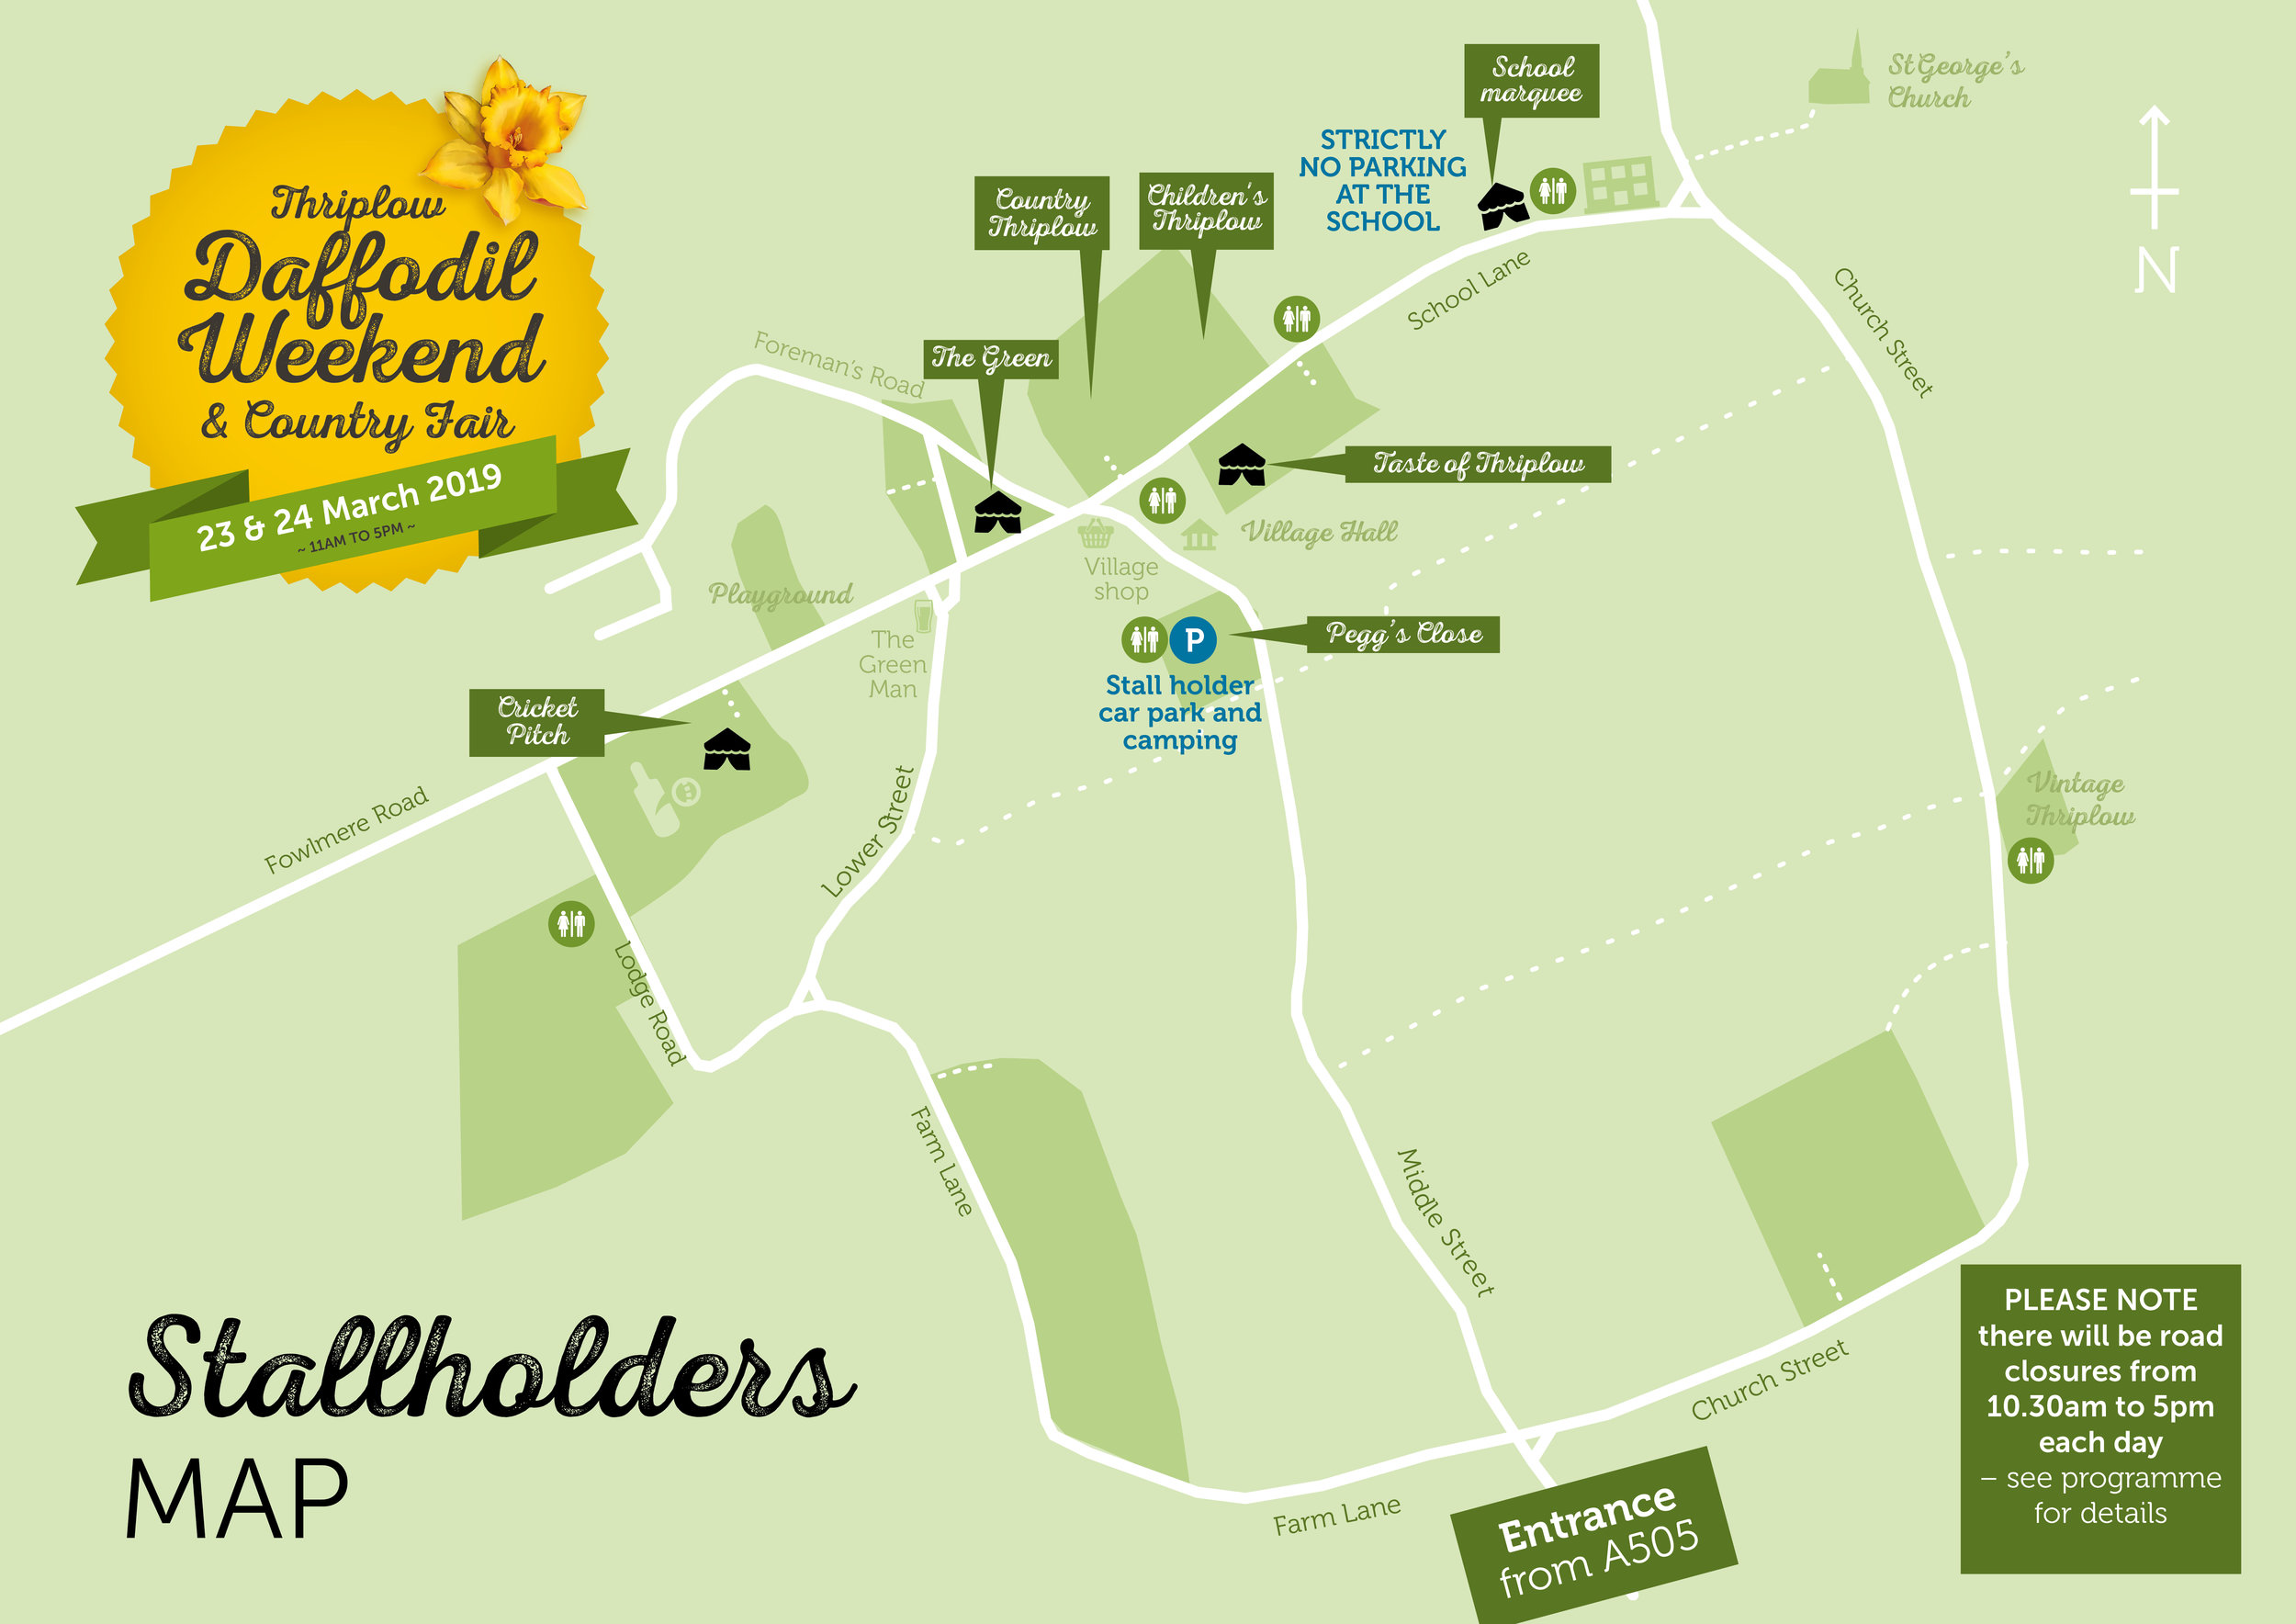 13 Stallholders map-1.jpg